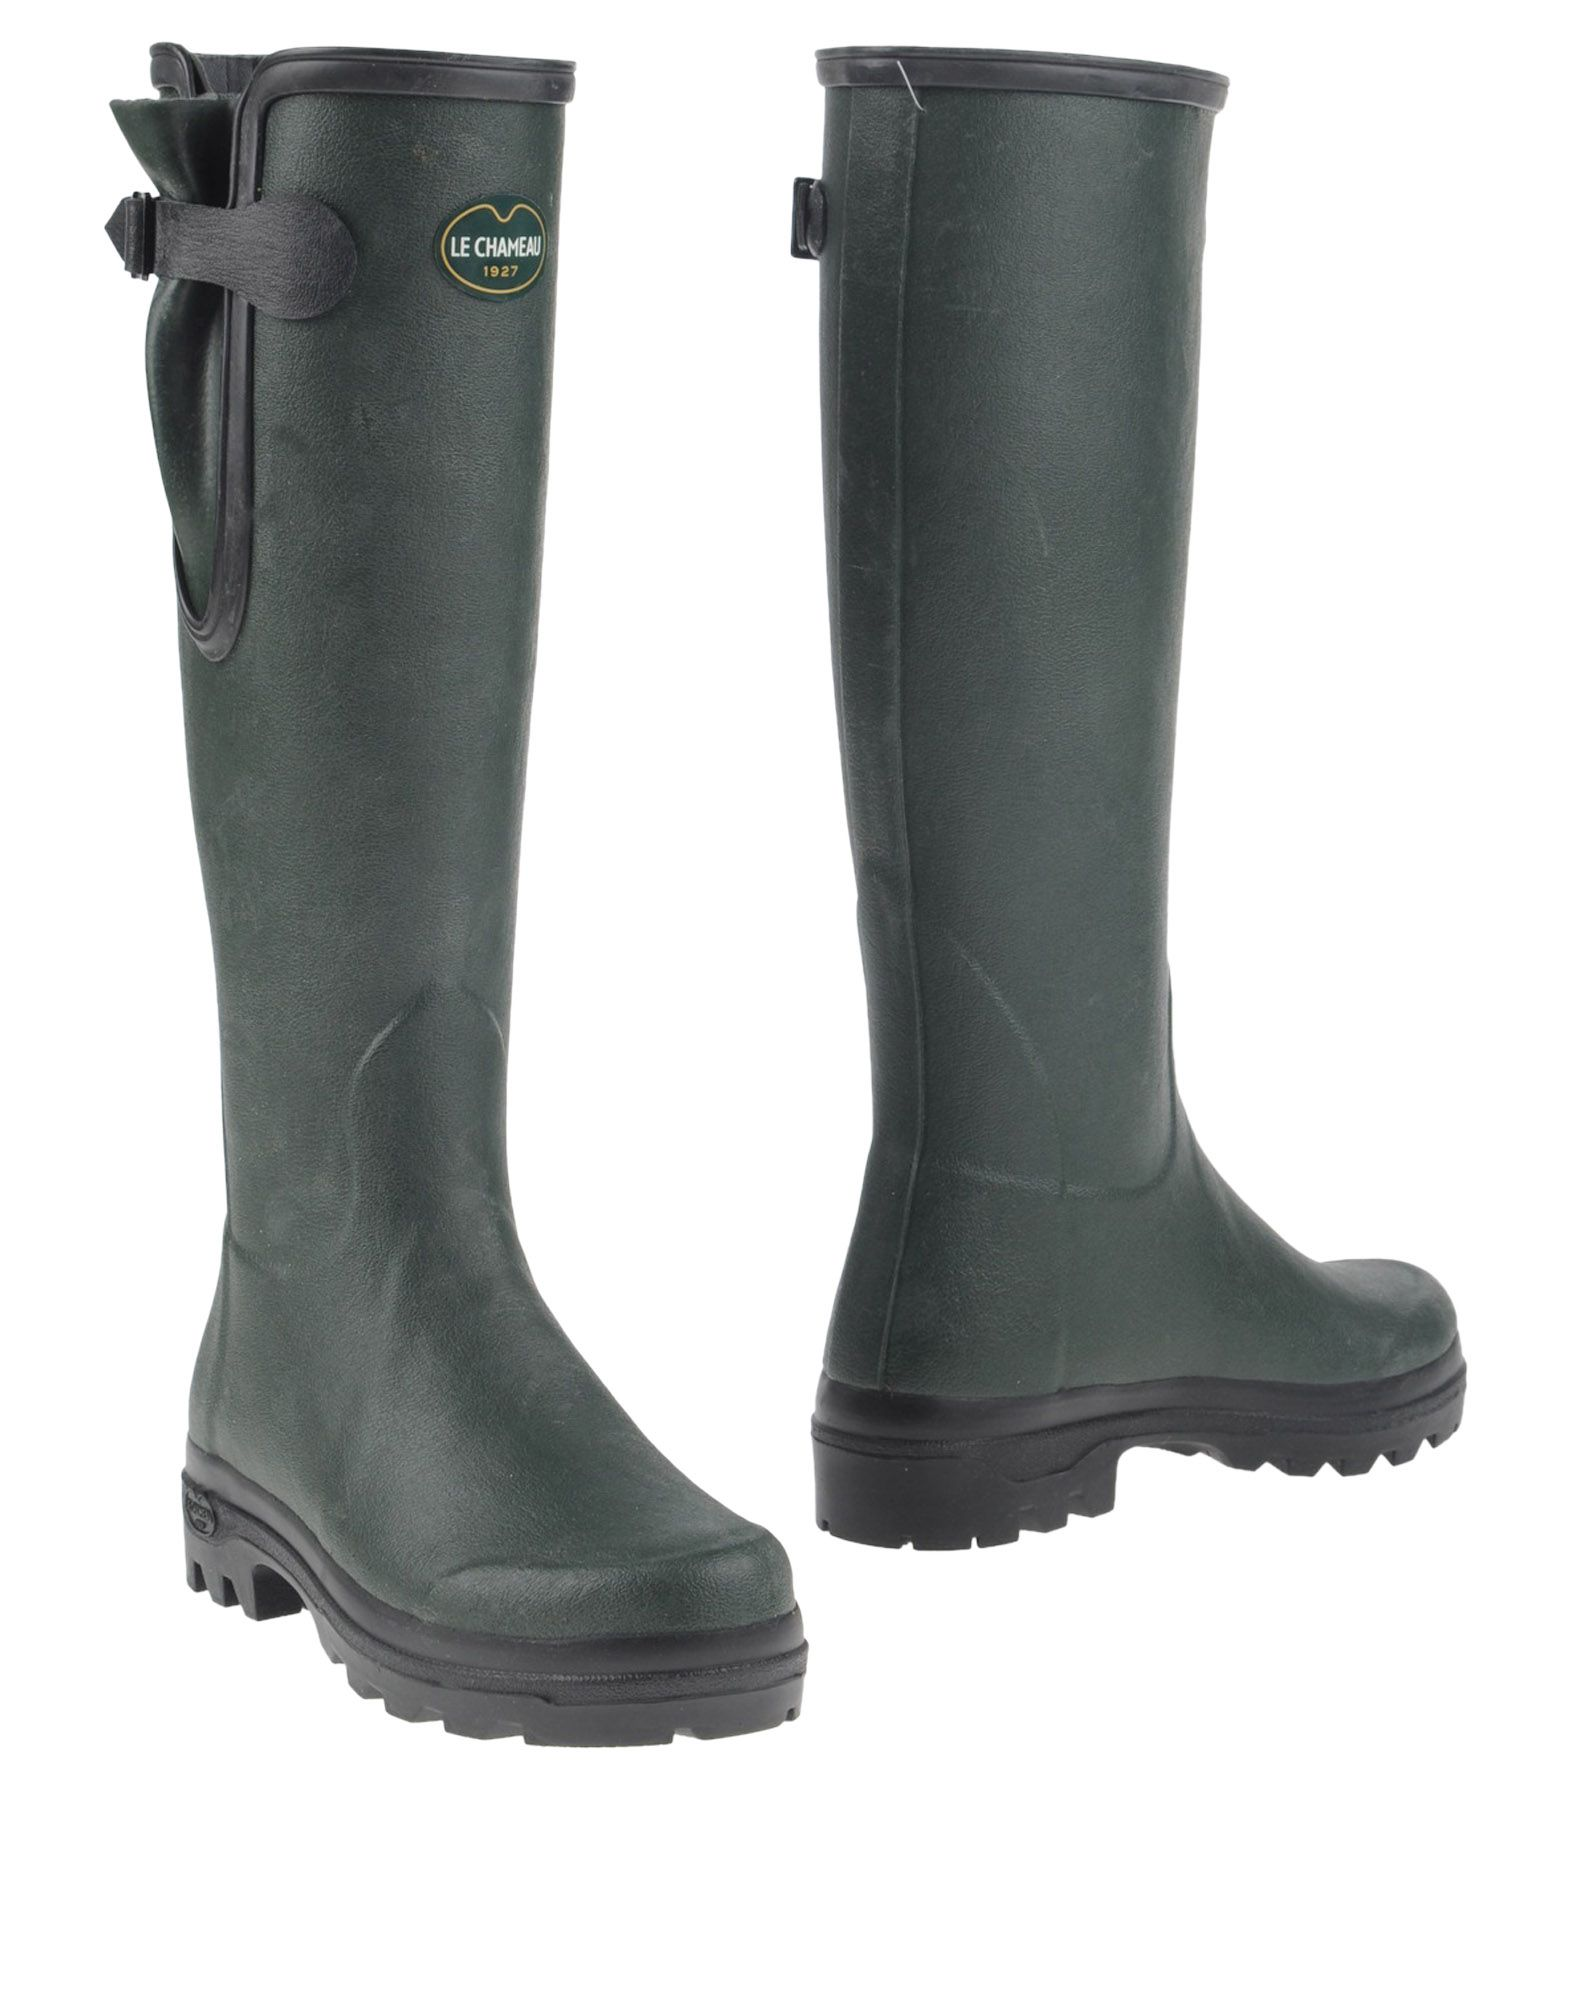 LE CHAMEAU Сапоги le royal кружева моды на высоких каблуках непромокаемые сапоги воды обувь g003 белый 39 ярдов